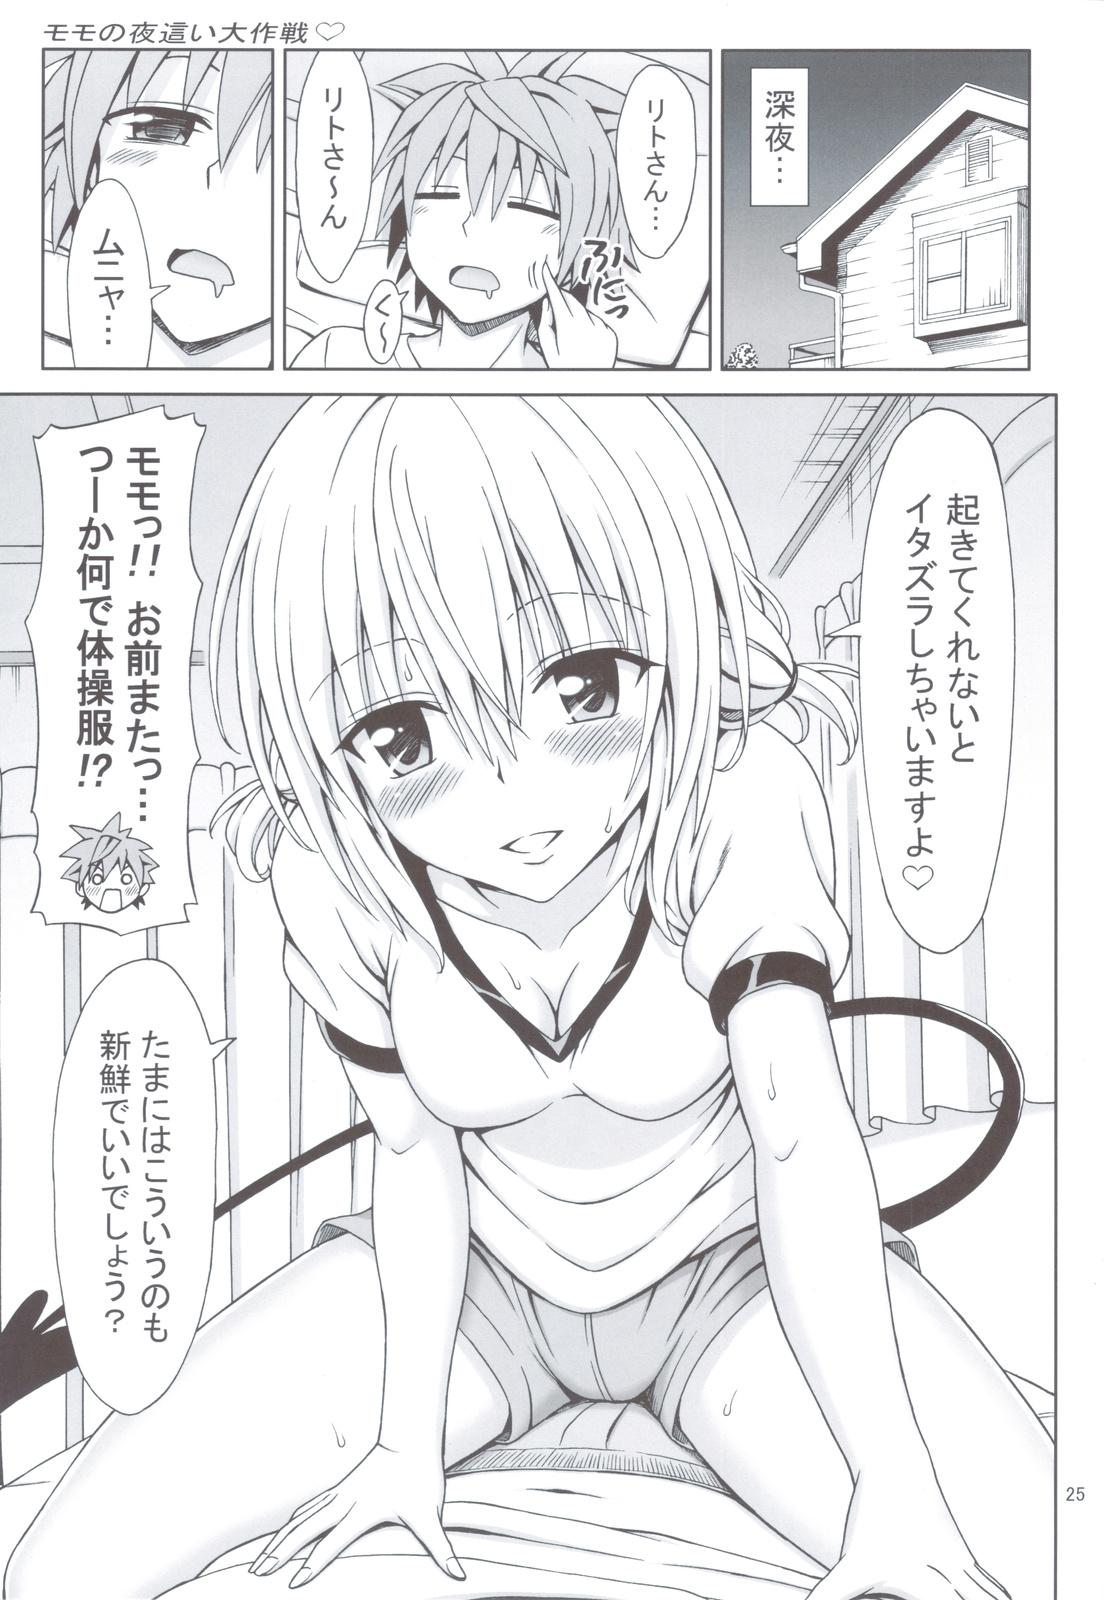 Tearju Sensei no Houkago Trouble 23